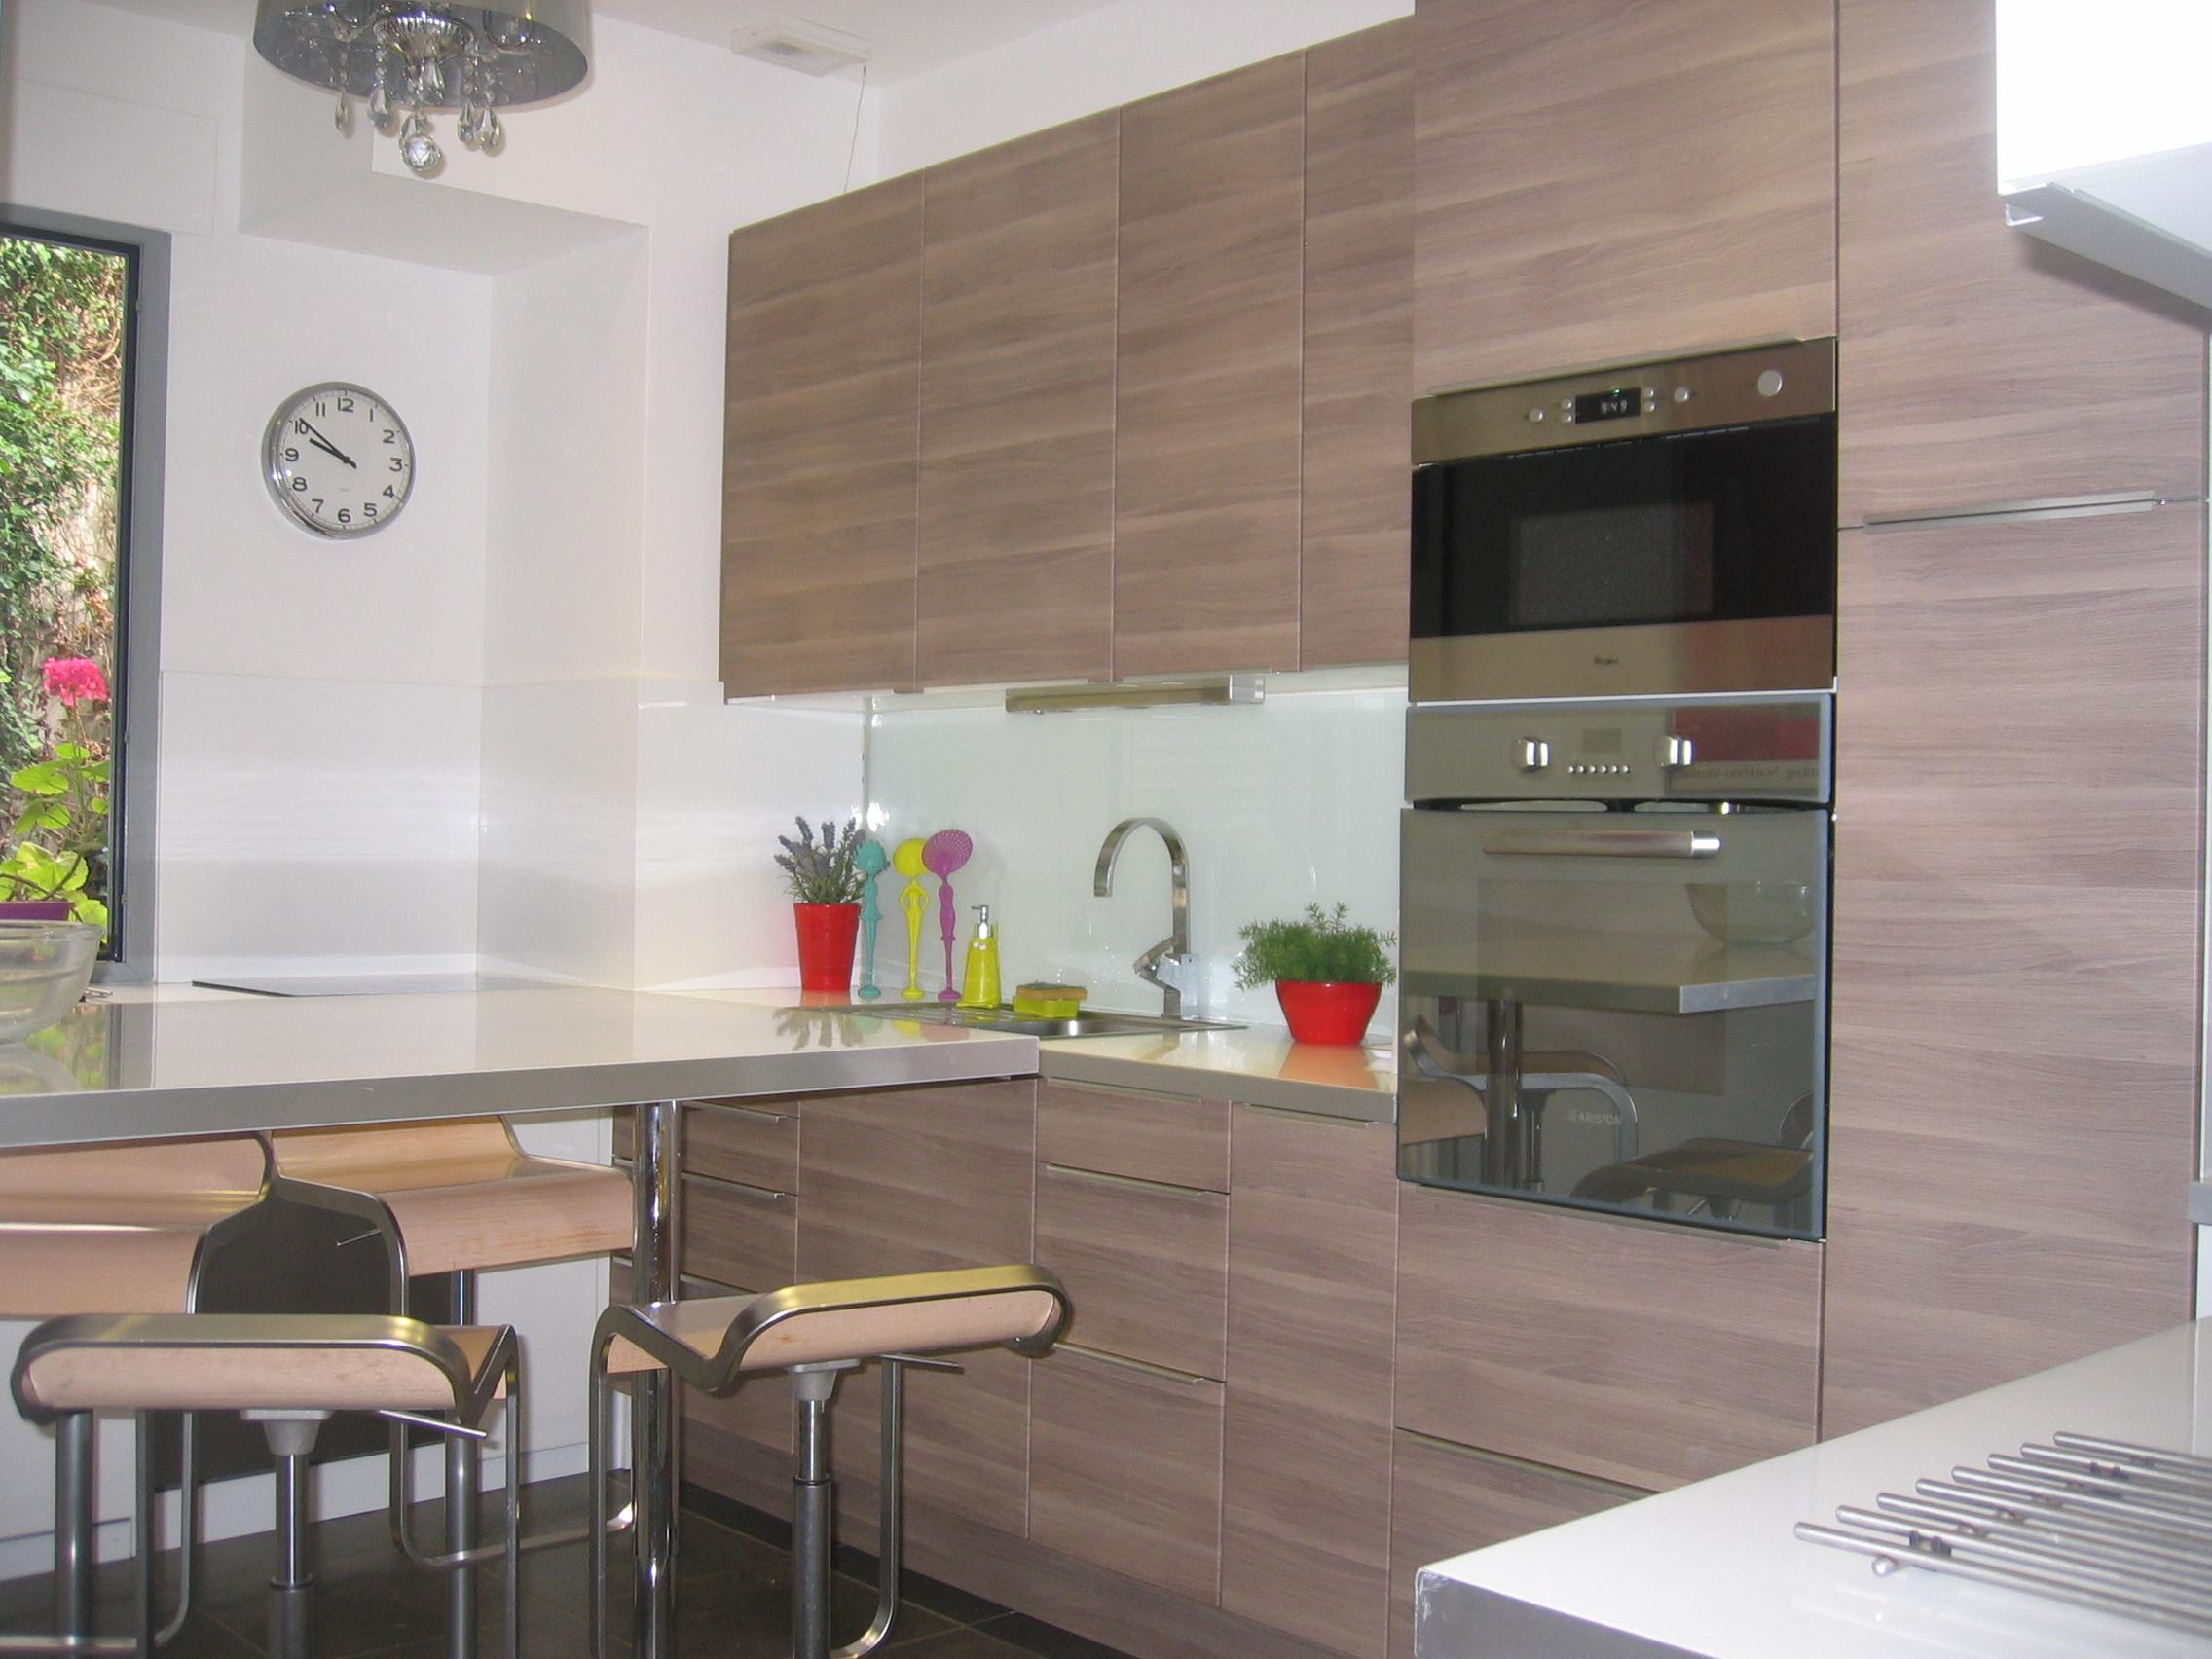 pose d 39 quipements de cuisine. Black Bedroom Furniture Sets. Home Design Ideas